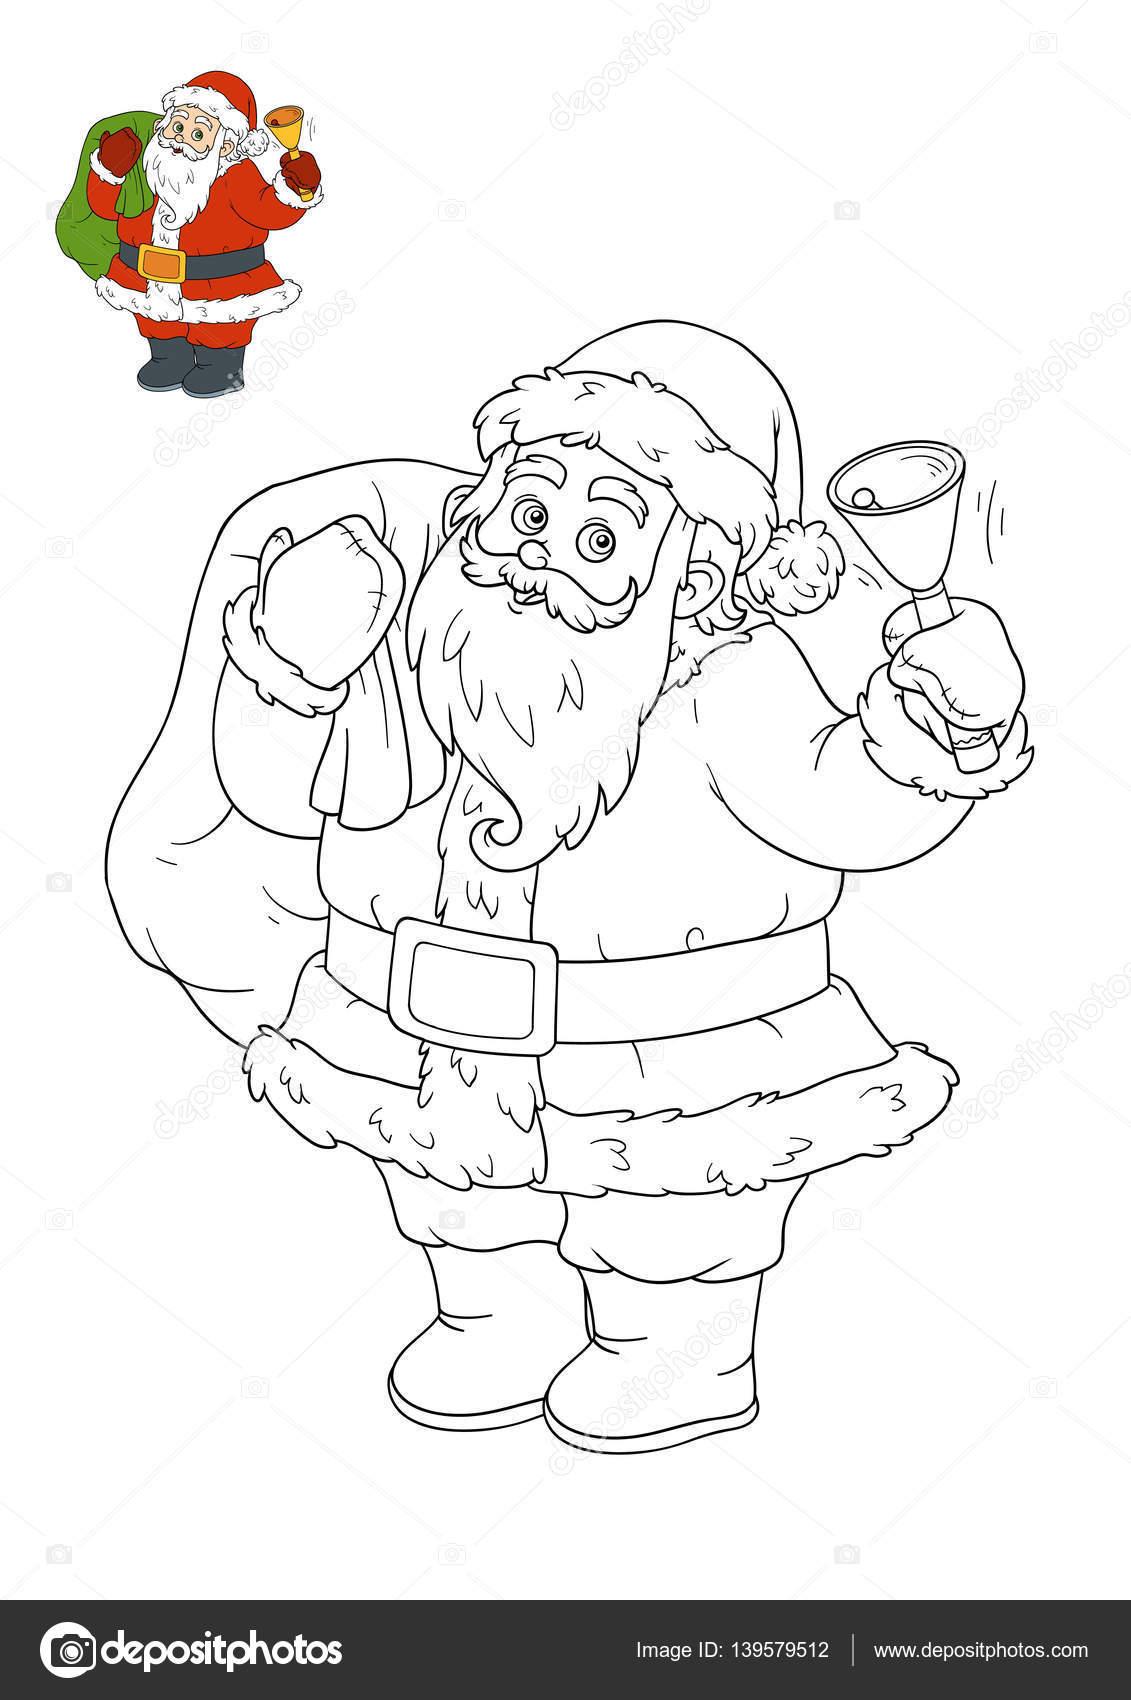 Libro para colorear, Papá Noel — Foto de stock © ksenya_savva #139579512